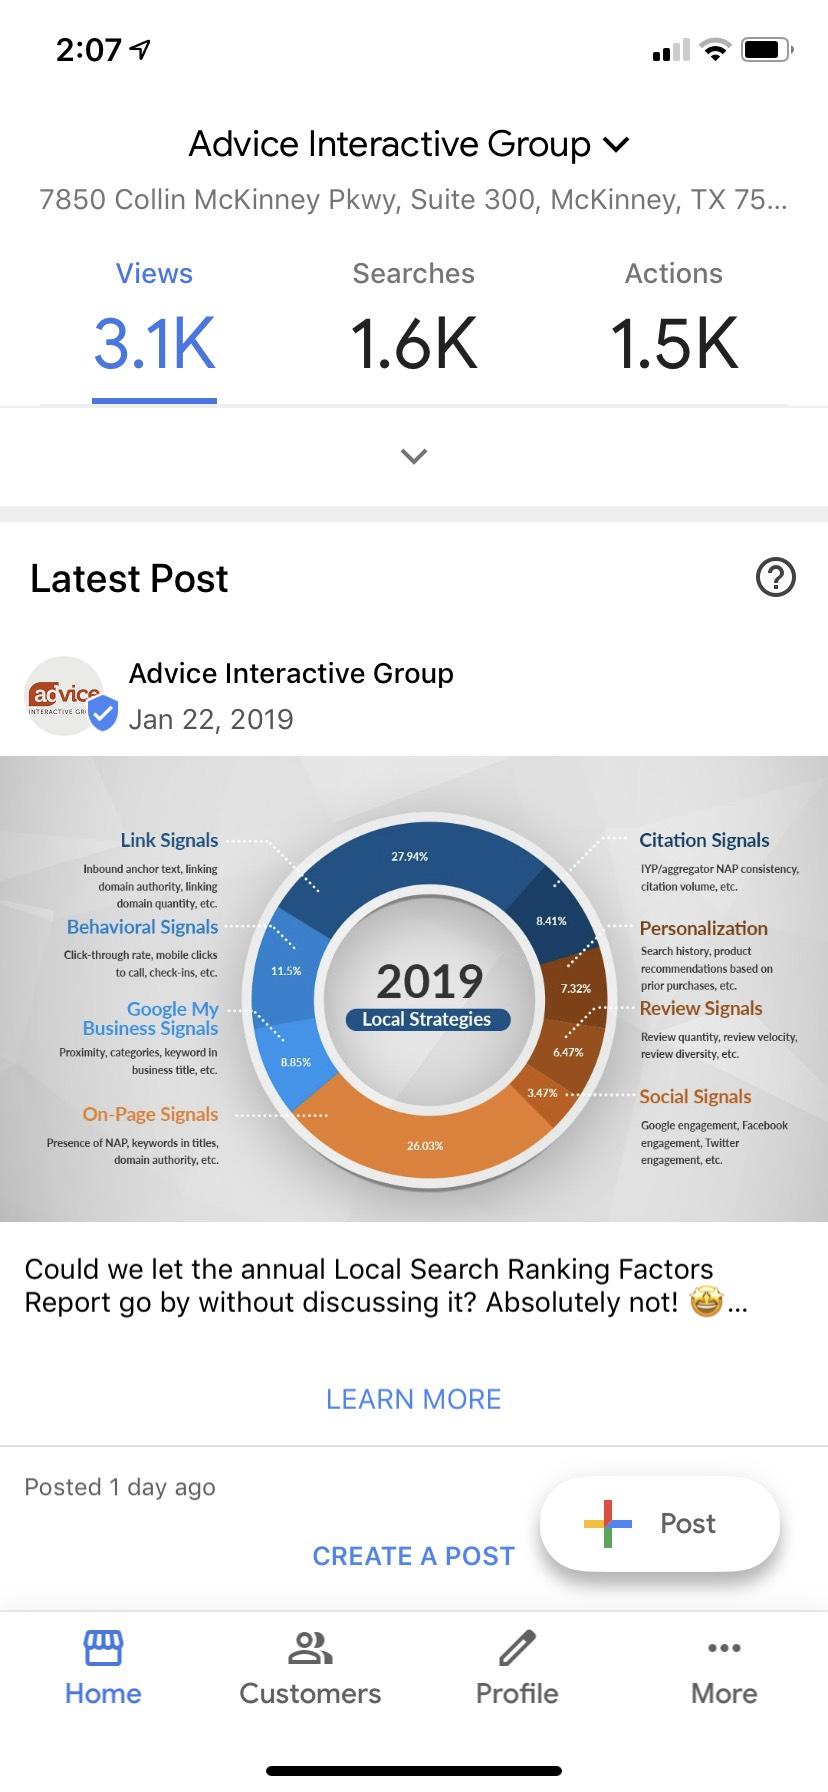 Understanding the Google My Business Mobile App - Home Screen